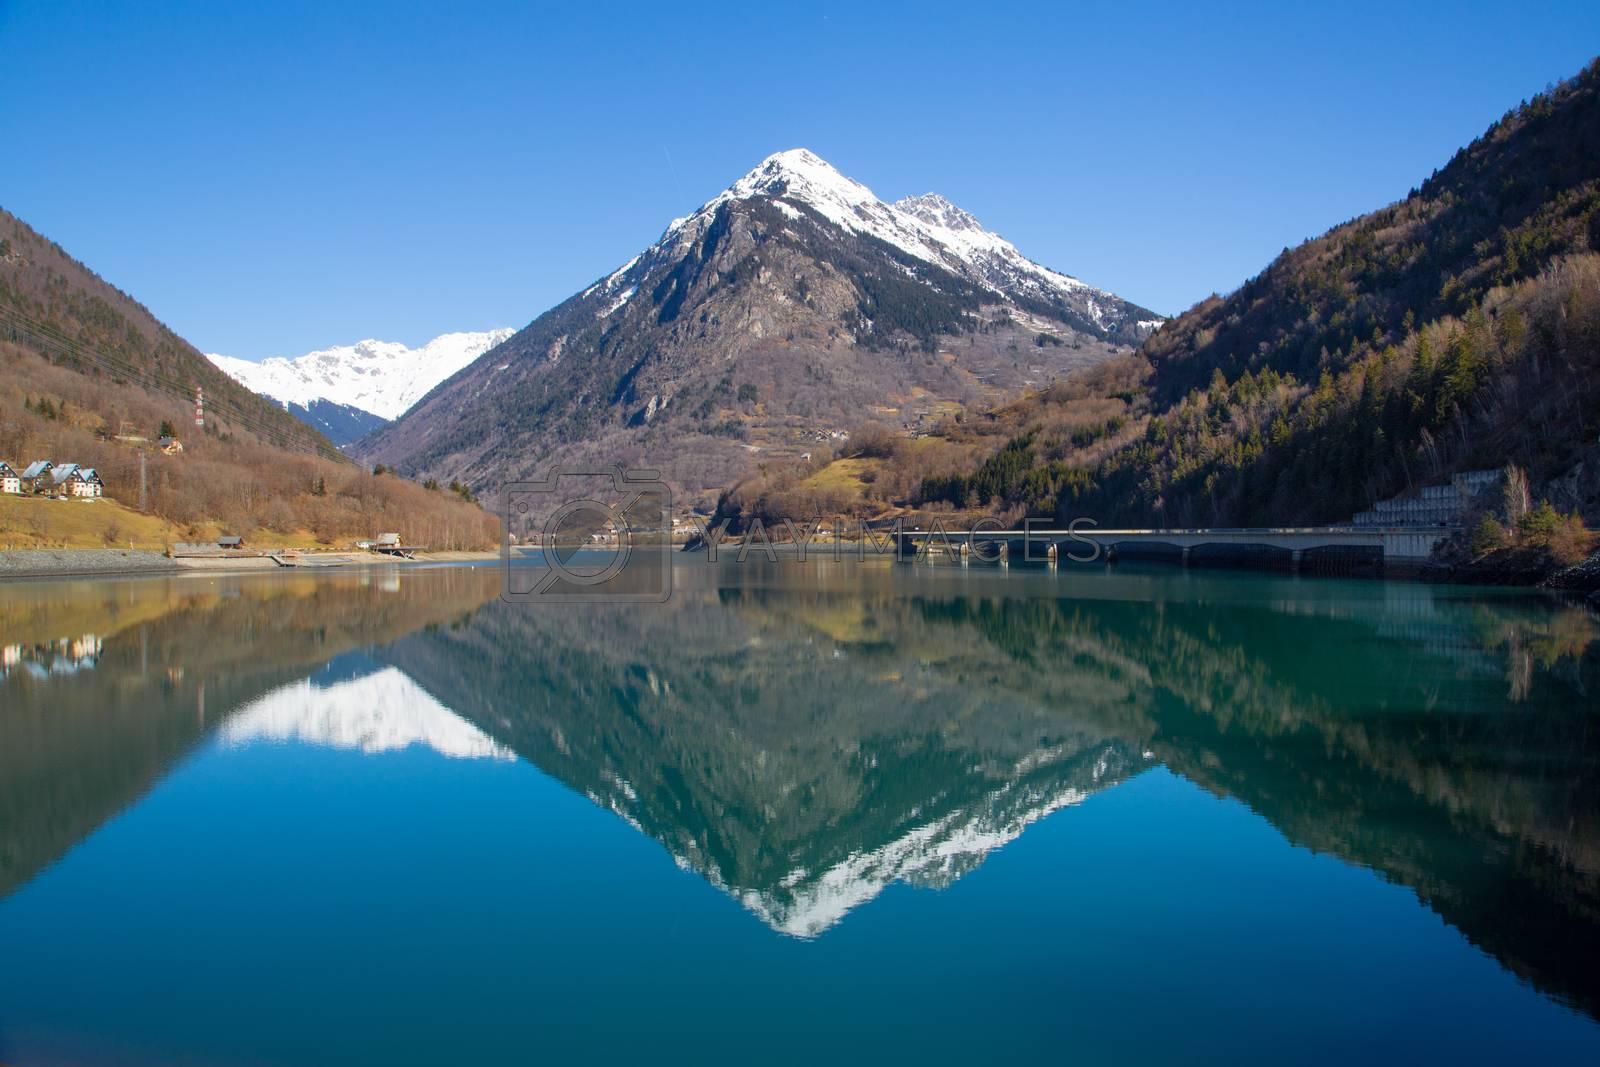 Alps in winter - 18 by Kartouchken